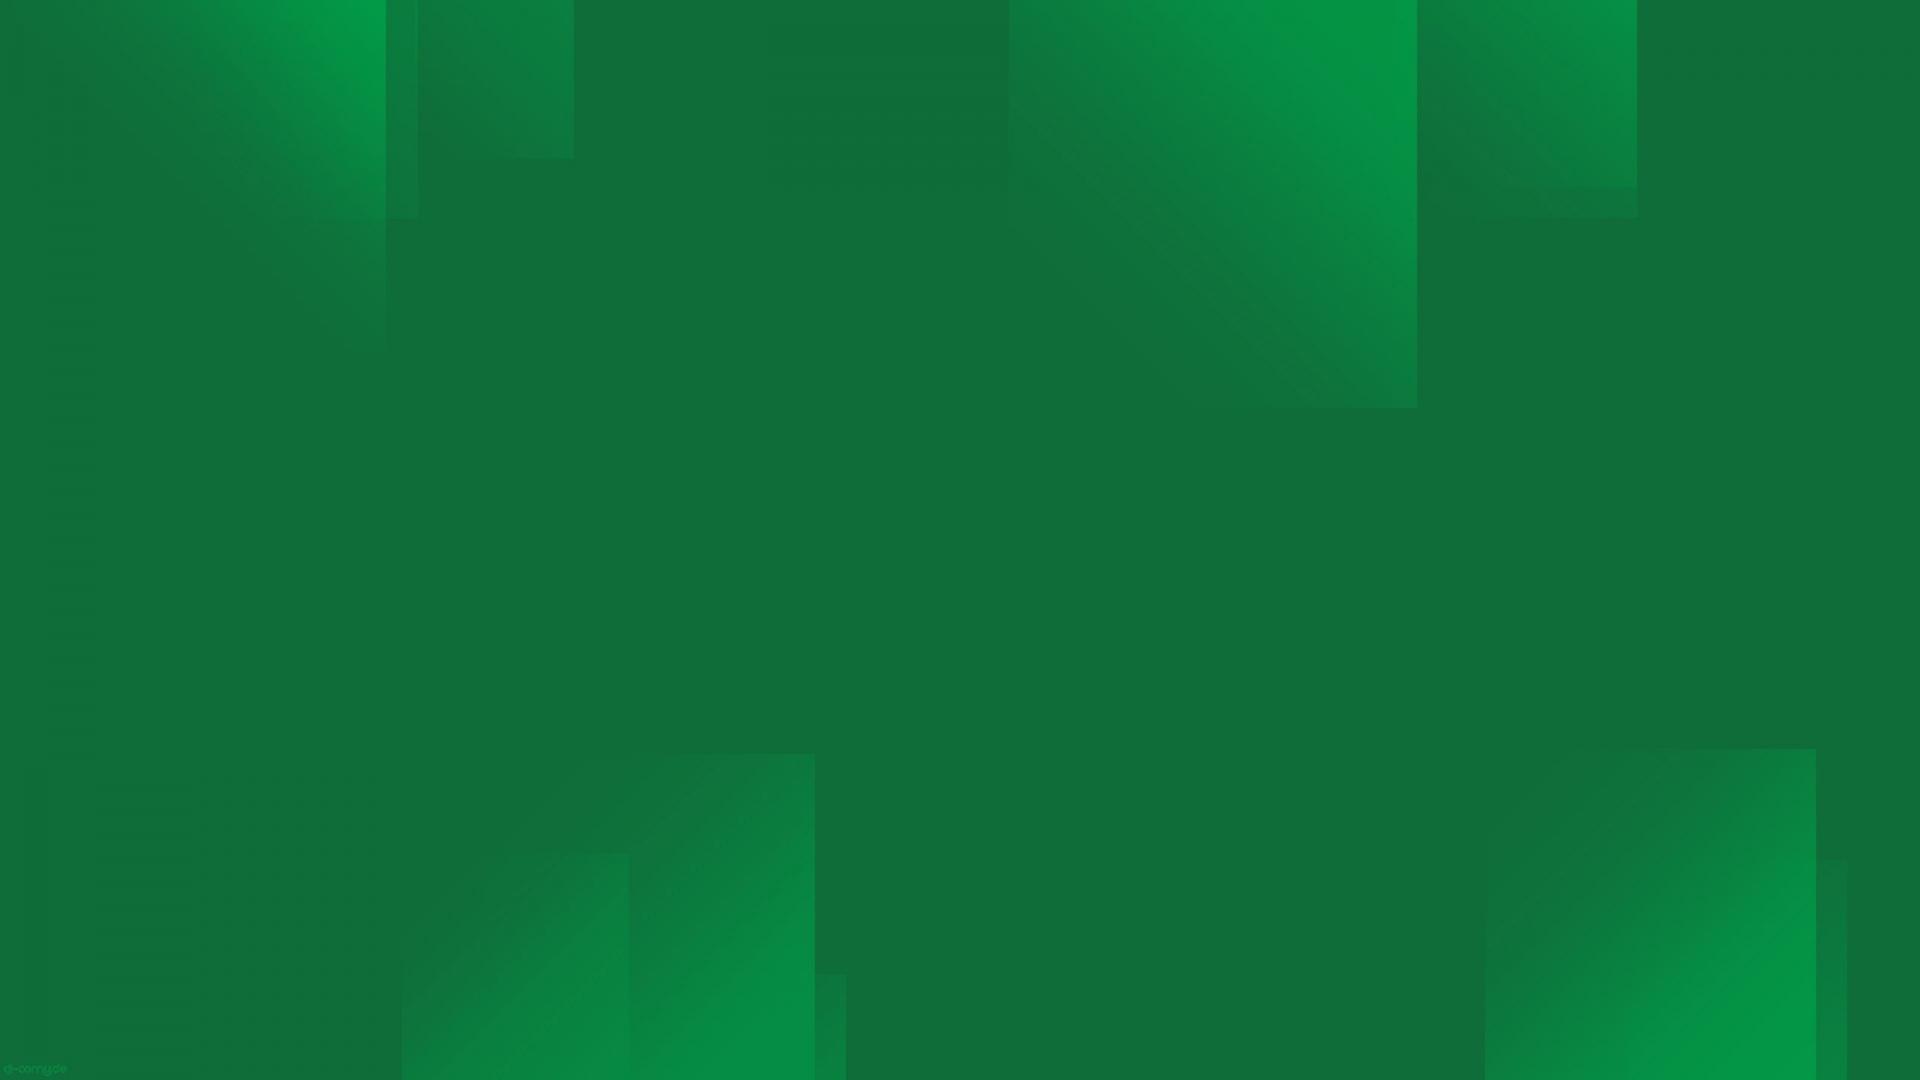 Dark green background wallpaper wallpapersafari for Pack fond ecran hd